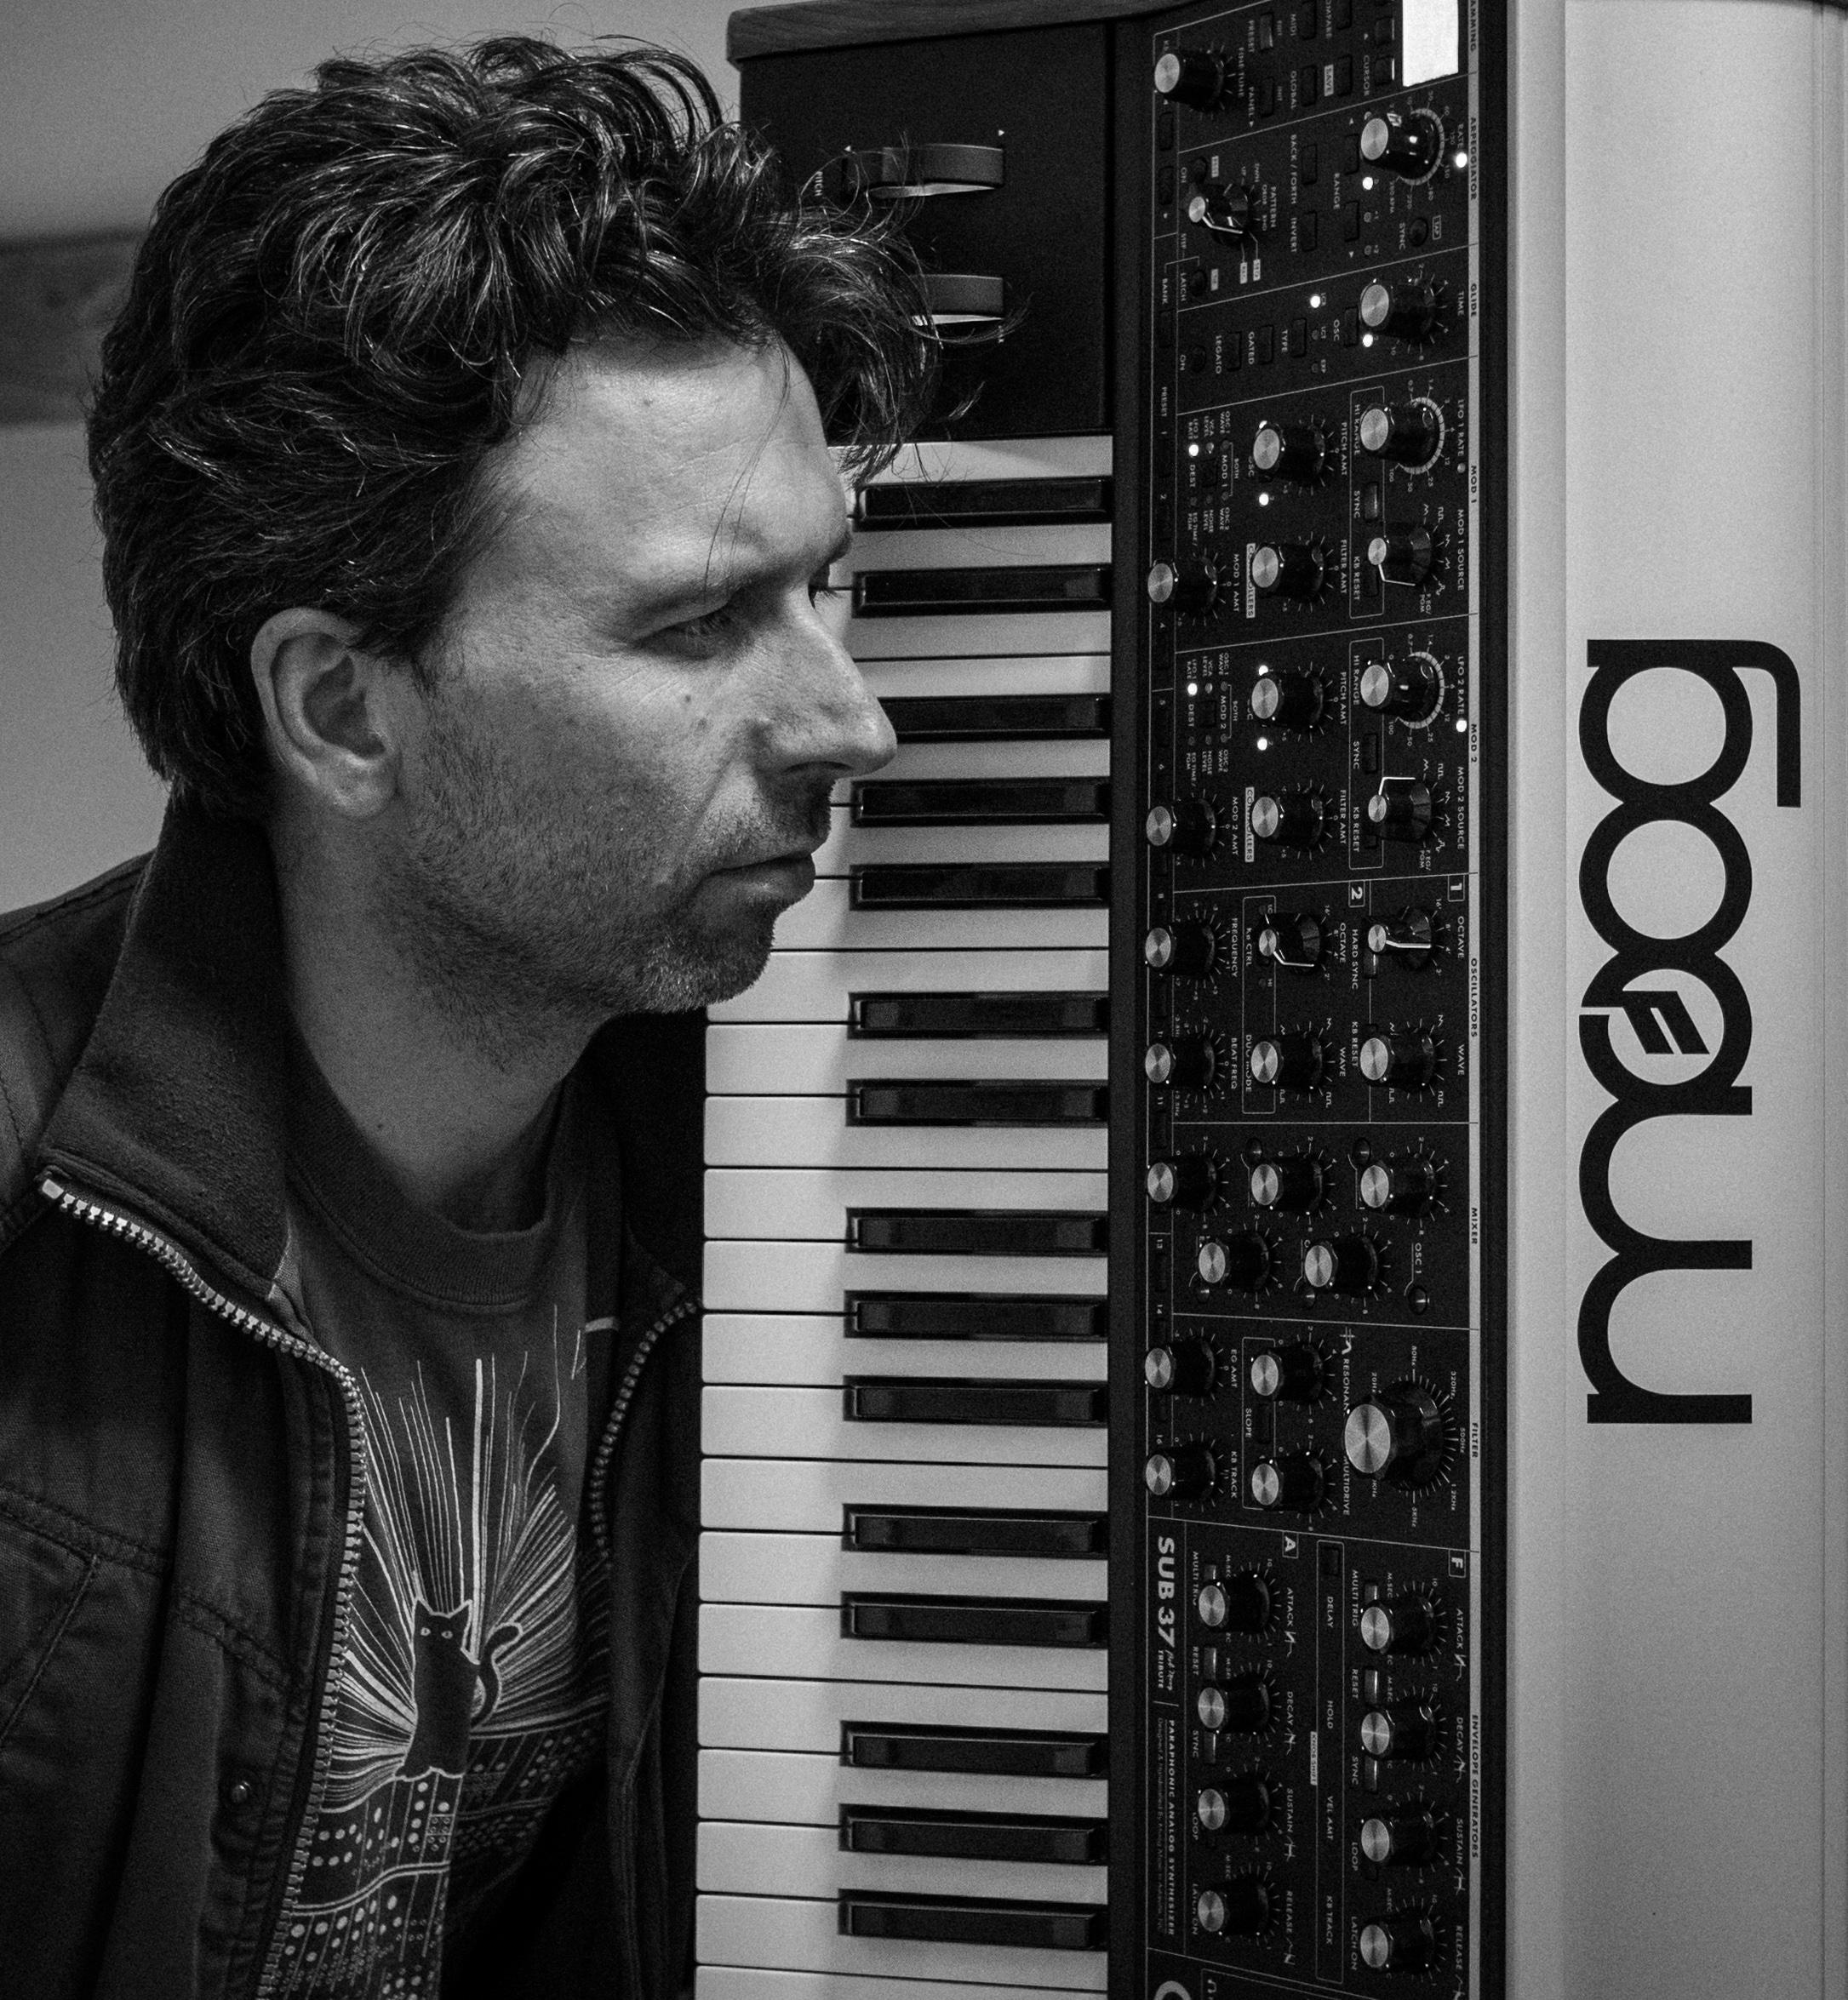 Robin Bigwood staring at knobs of a Moog SUB37 synthesizer